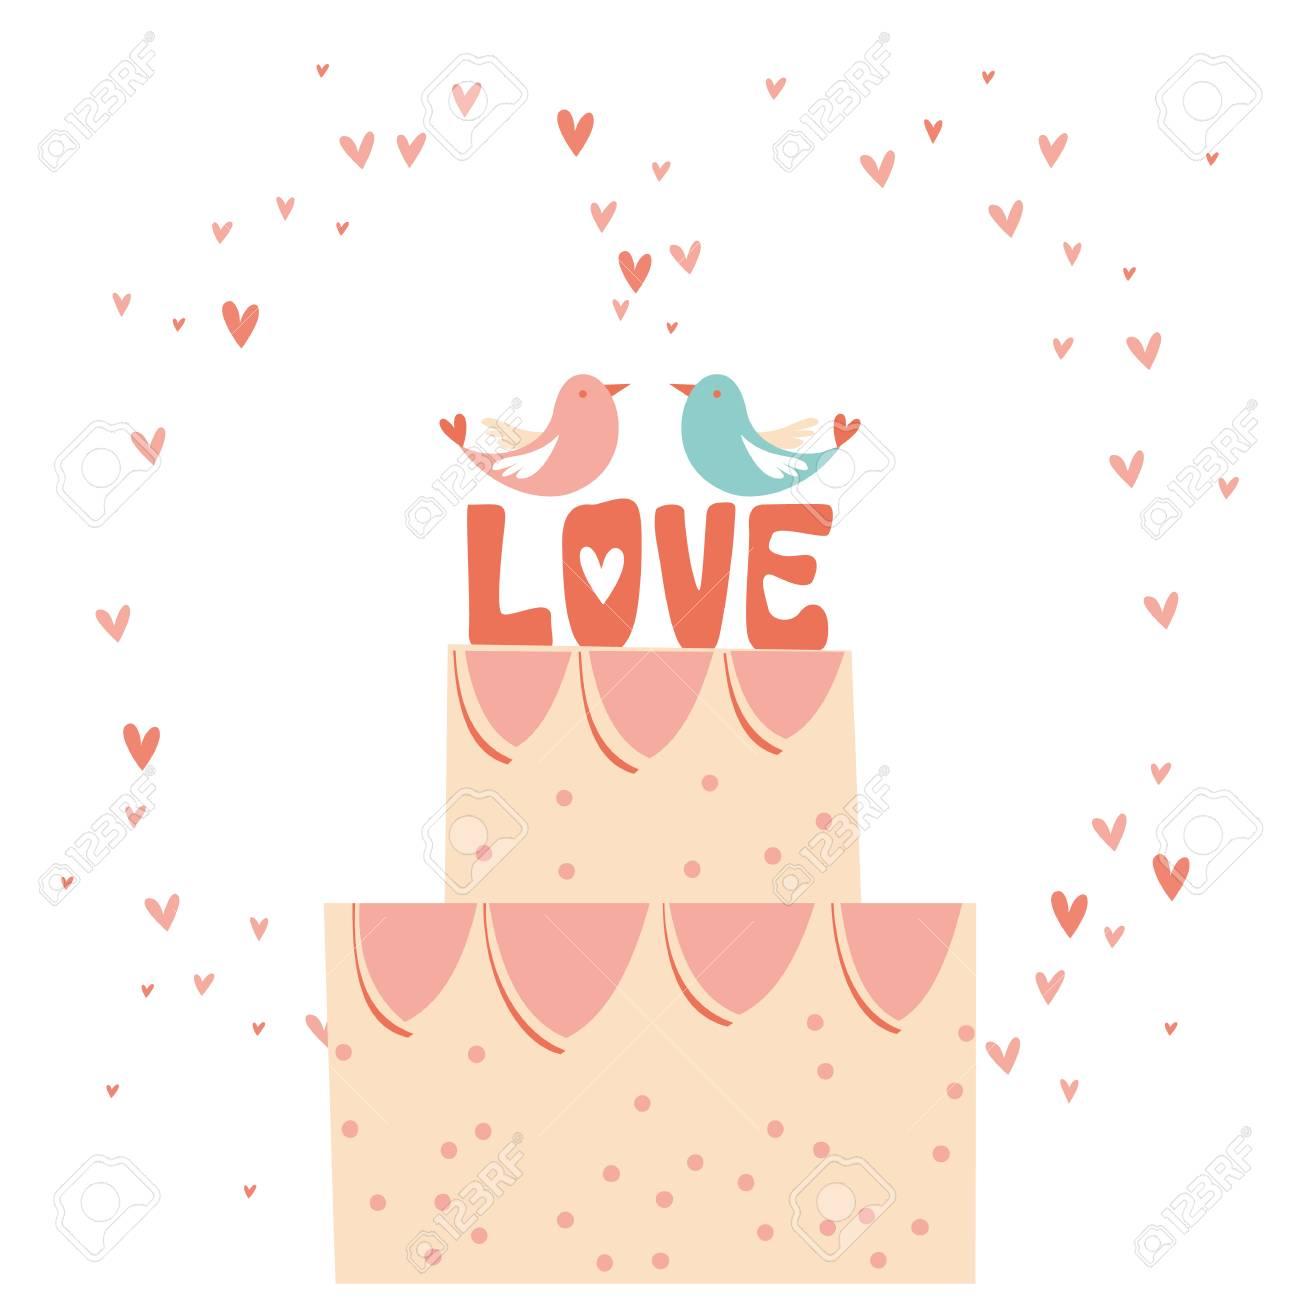 Stacked Wedding Cake Dessert With Heart Topper Line Art Vector